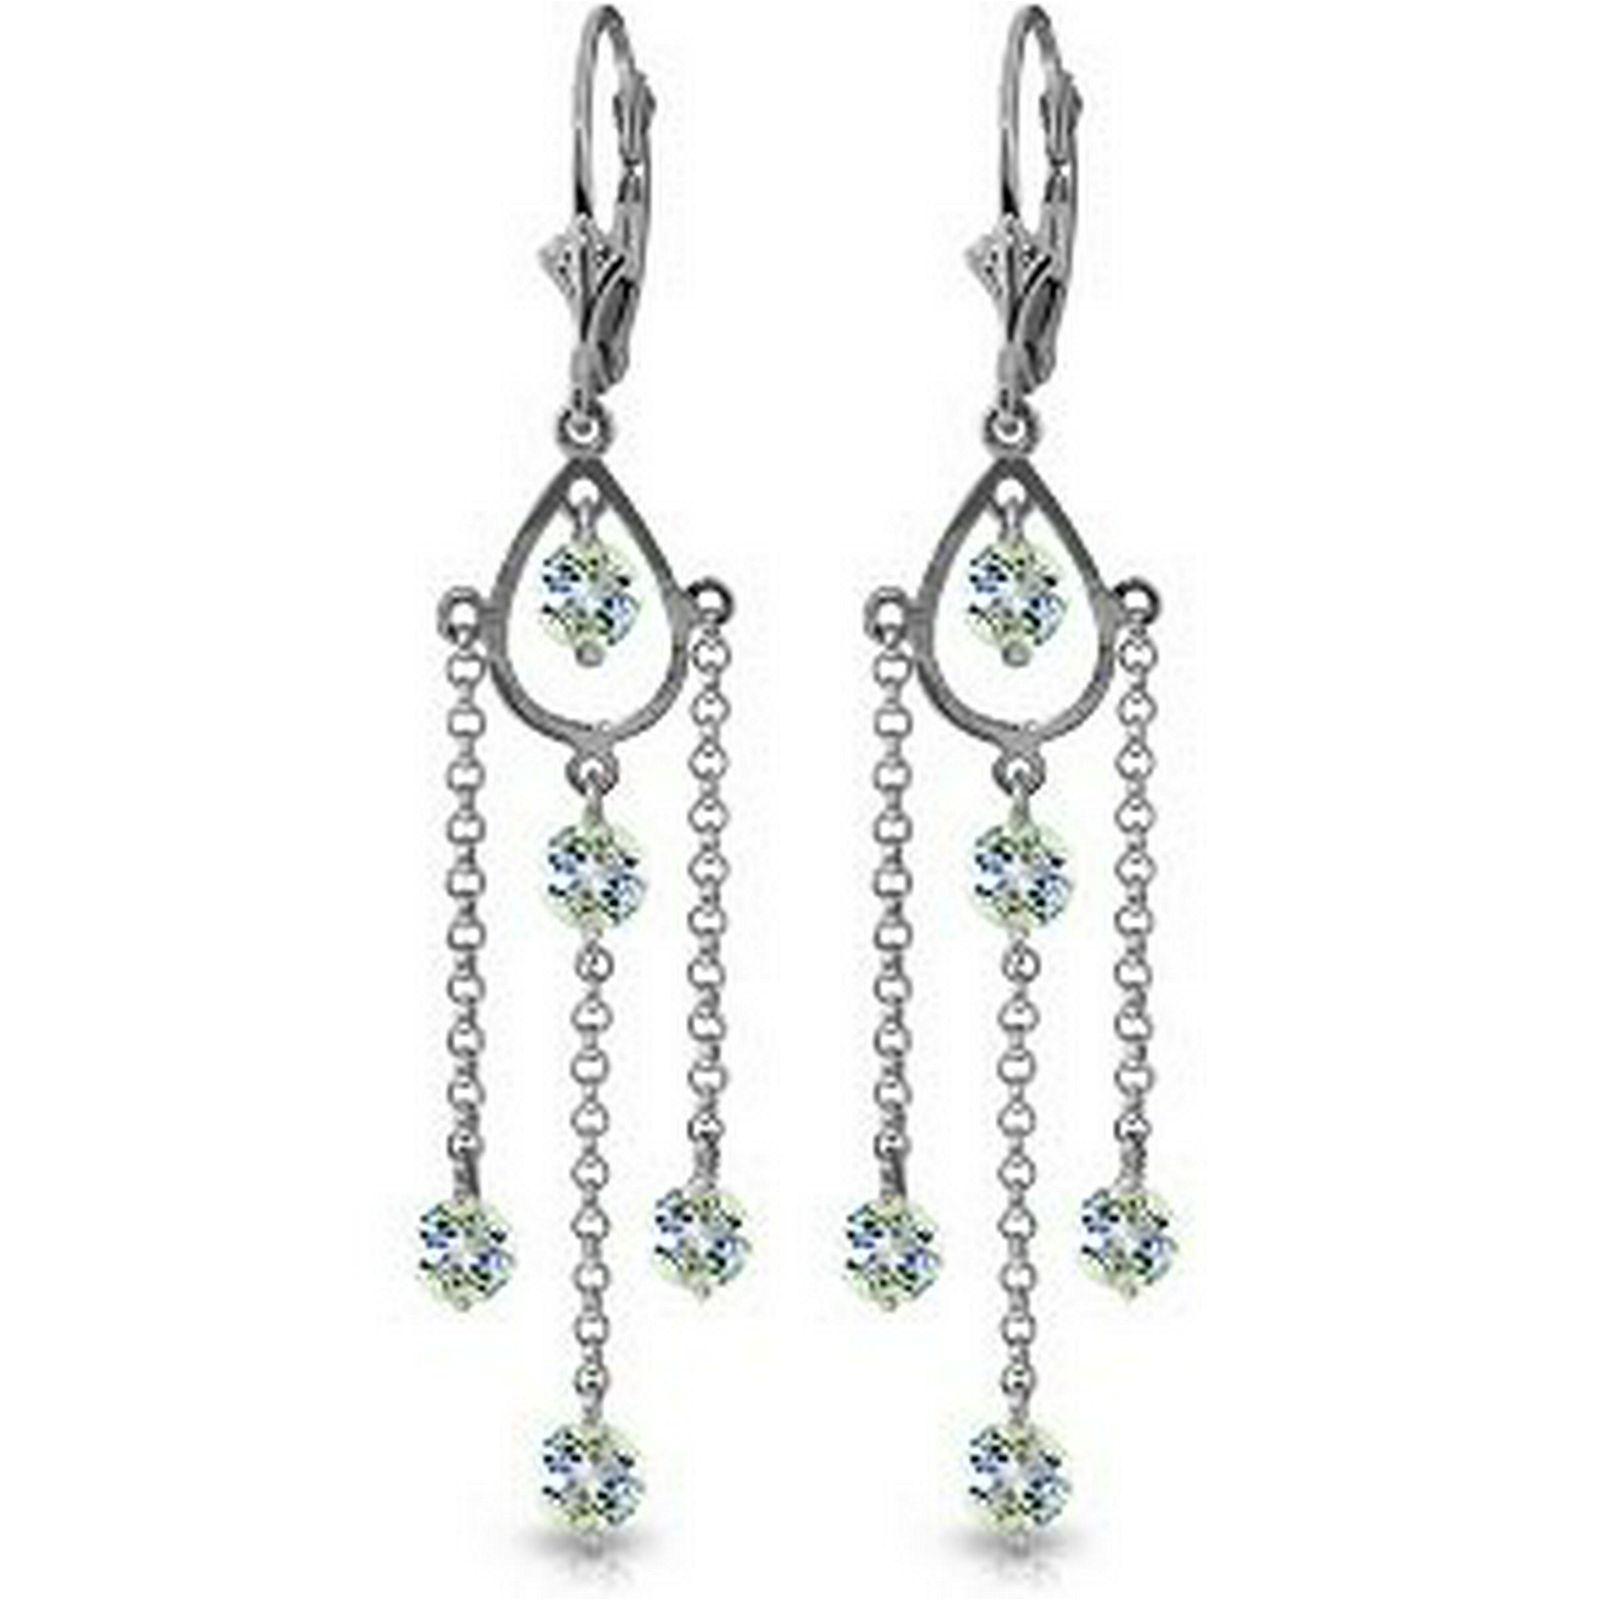 3 Carat 14K Solid White Gold Chandelier Earrings Natura